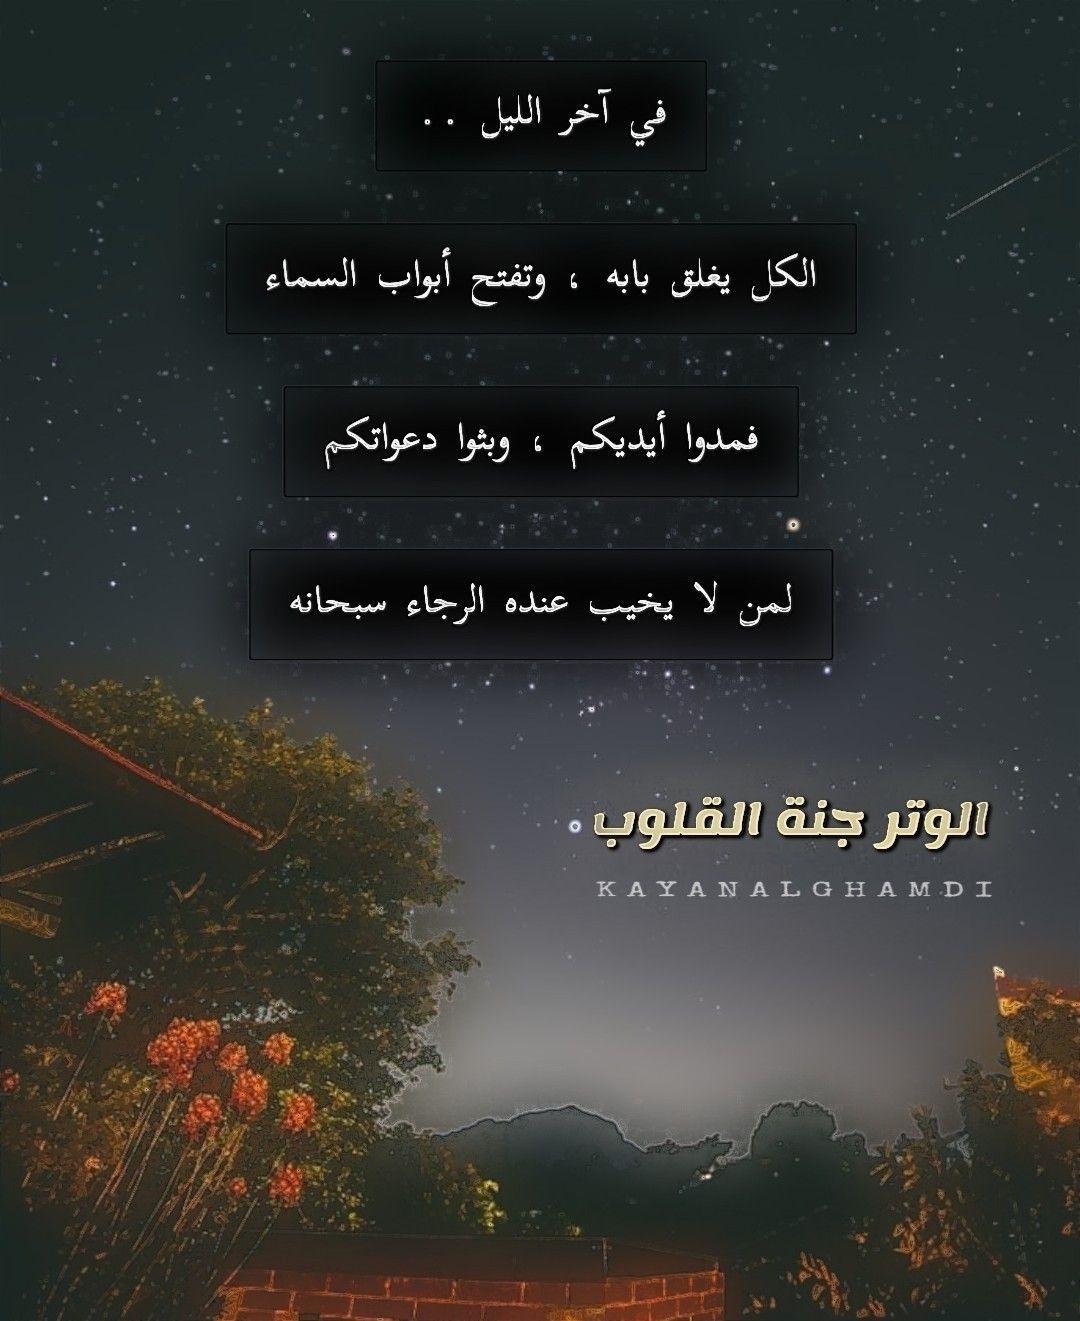 Pin By أم ابراهيم الغامدي On الوتر جنة القلوب Lockscreen Screenshot Lockscreen Screenshots